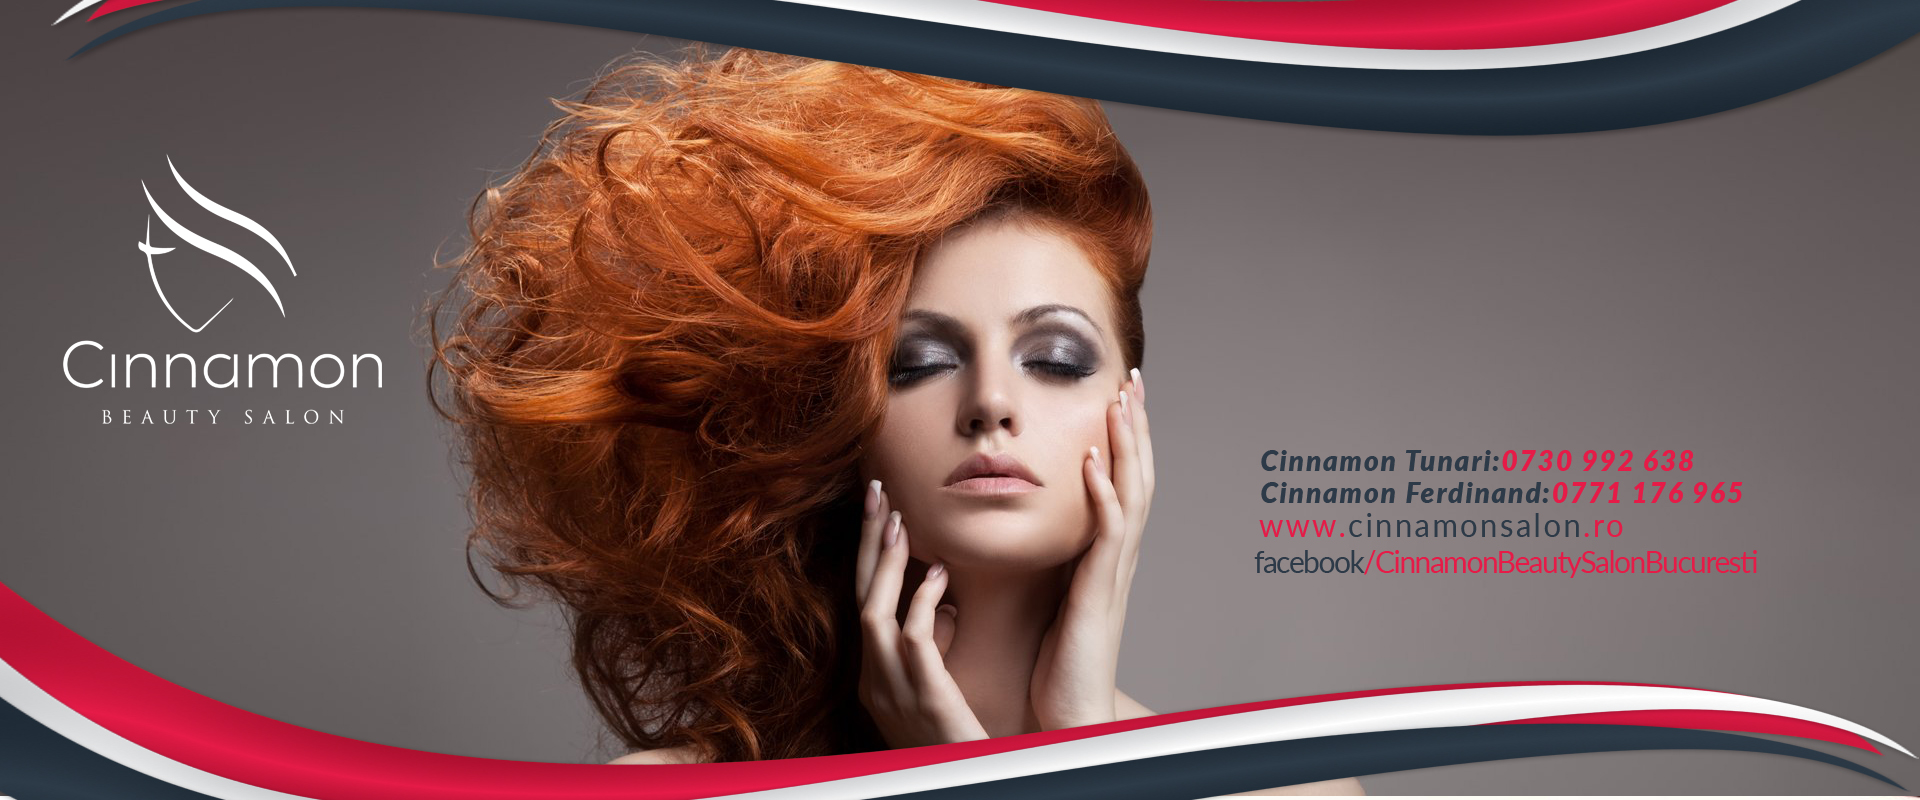 Cinnamon salon infrumusetare bucuresti, manichiura, make-up, pedichiura, vopsit, masaj, Salon de Infrumusetare Sector 2